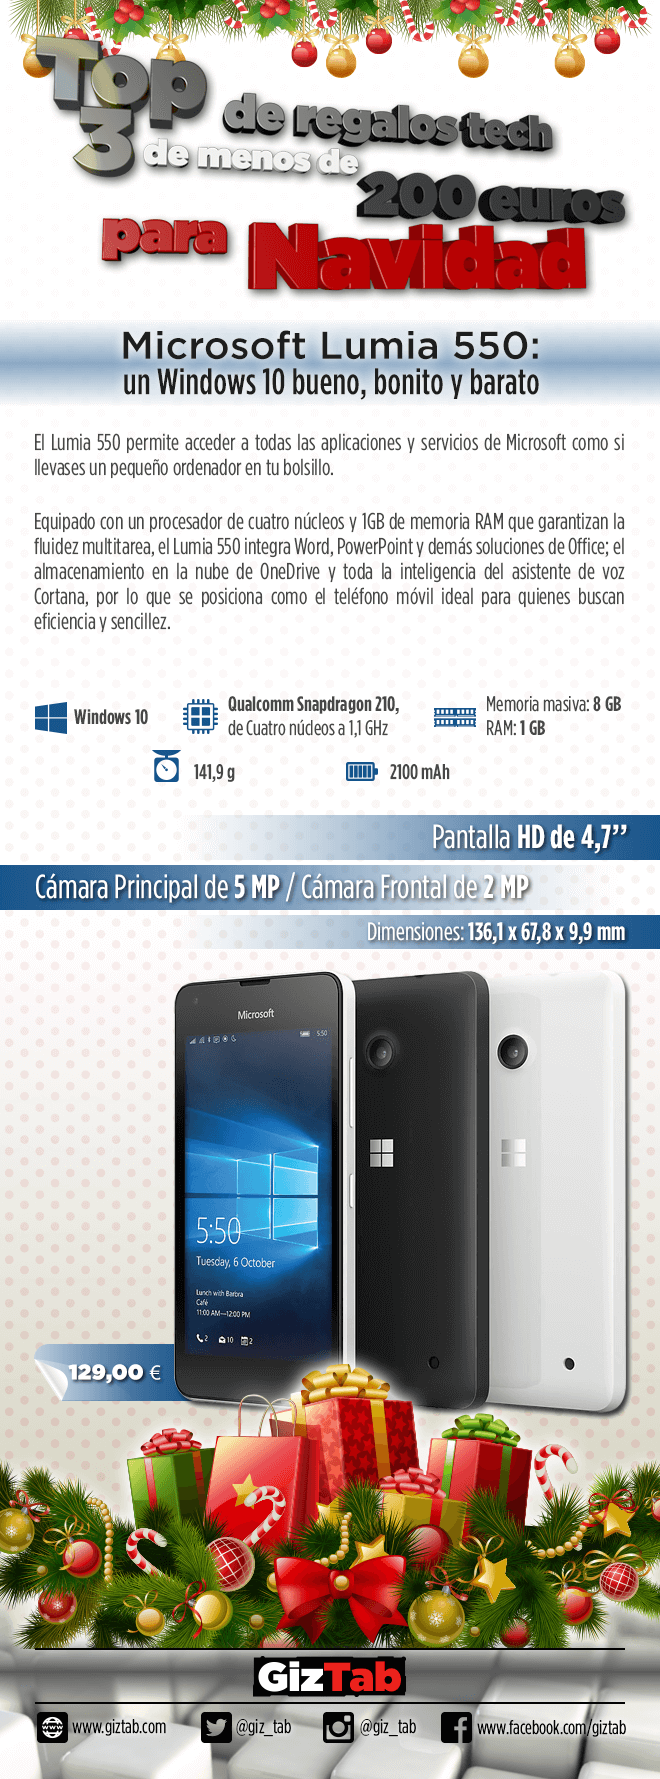 Microsoft Lumia 550_Infografía (1)